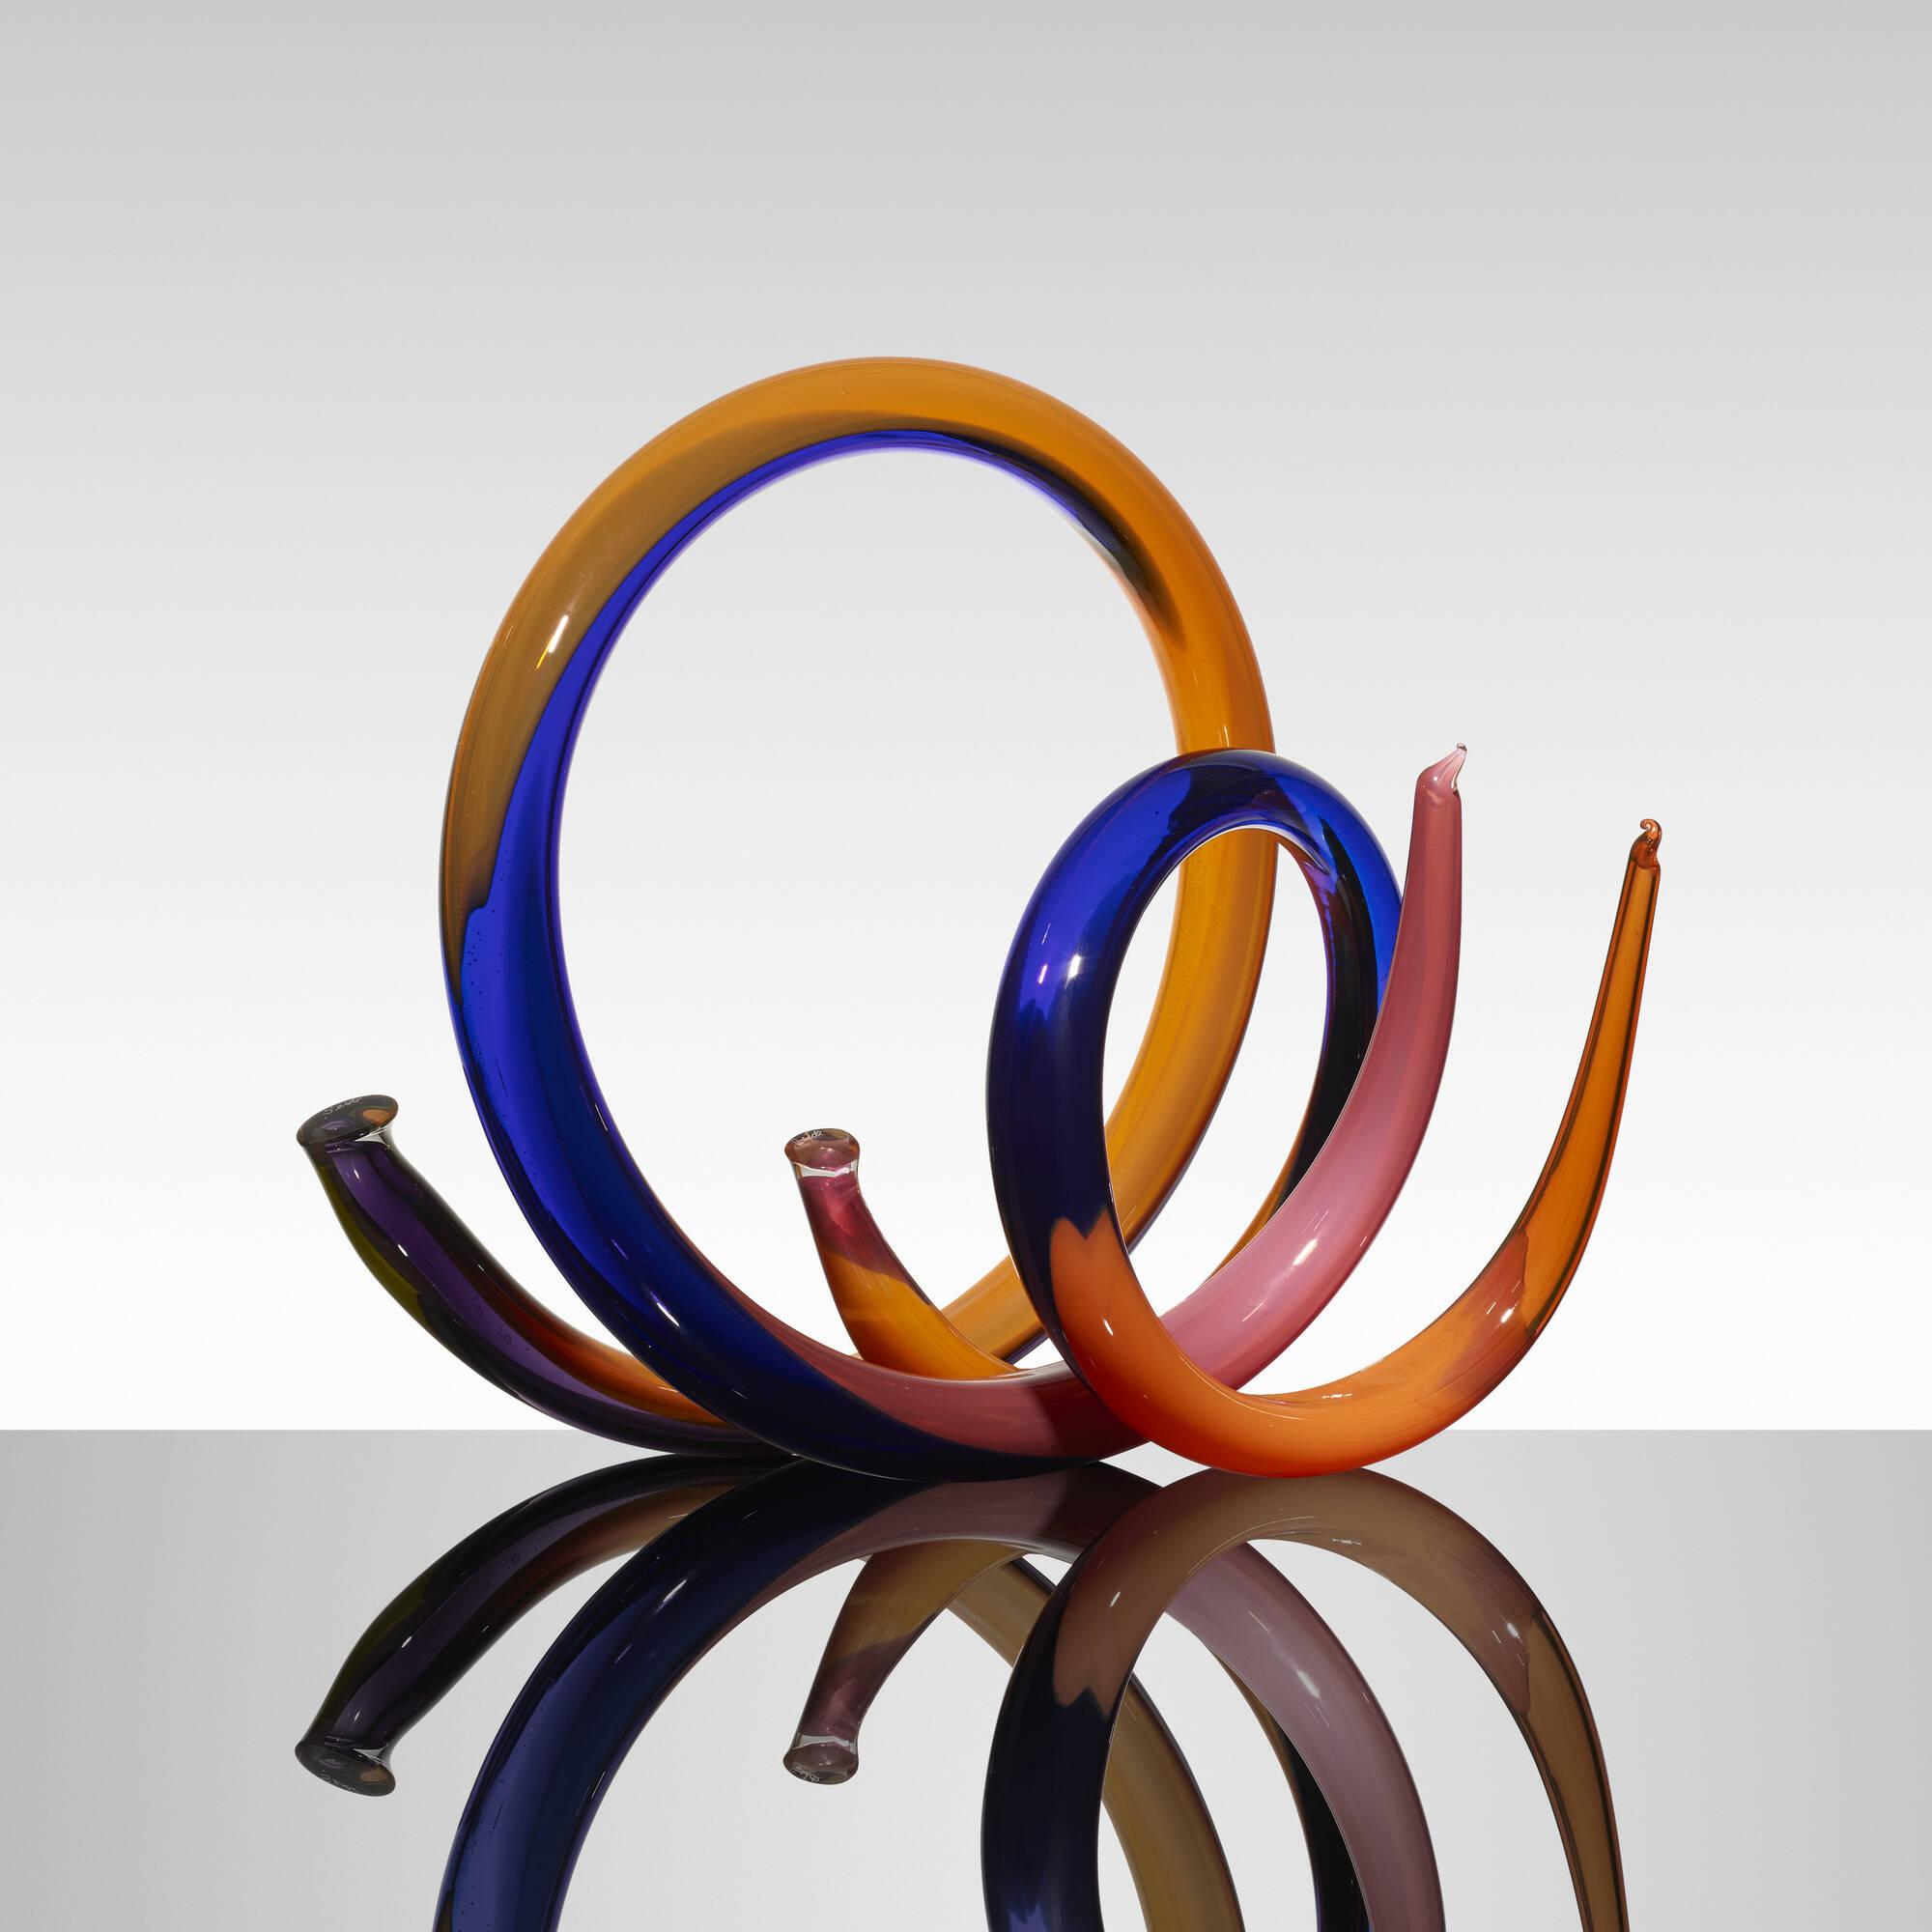 147: Paul Seide / Spiral Neon (1 of 4)